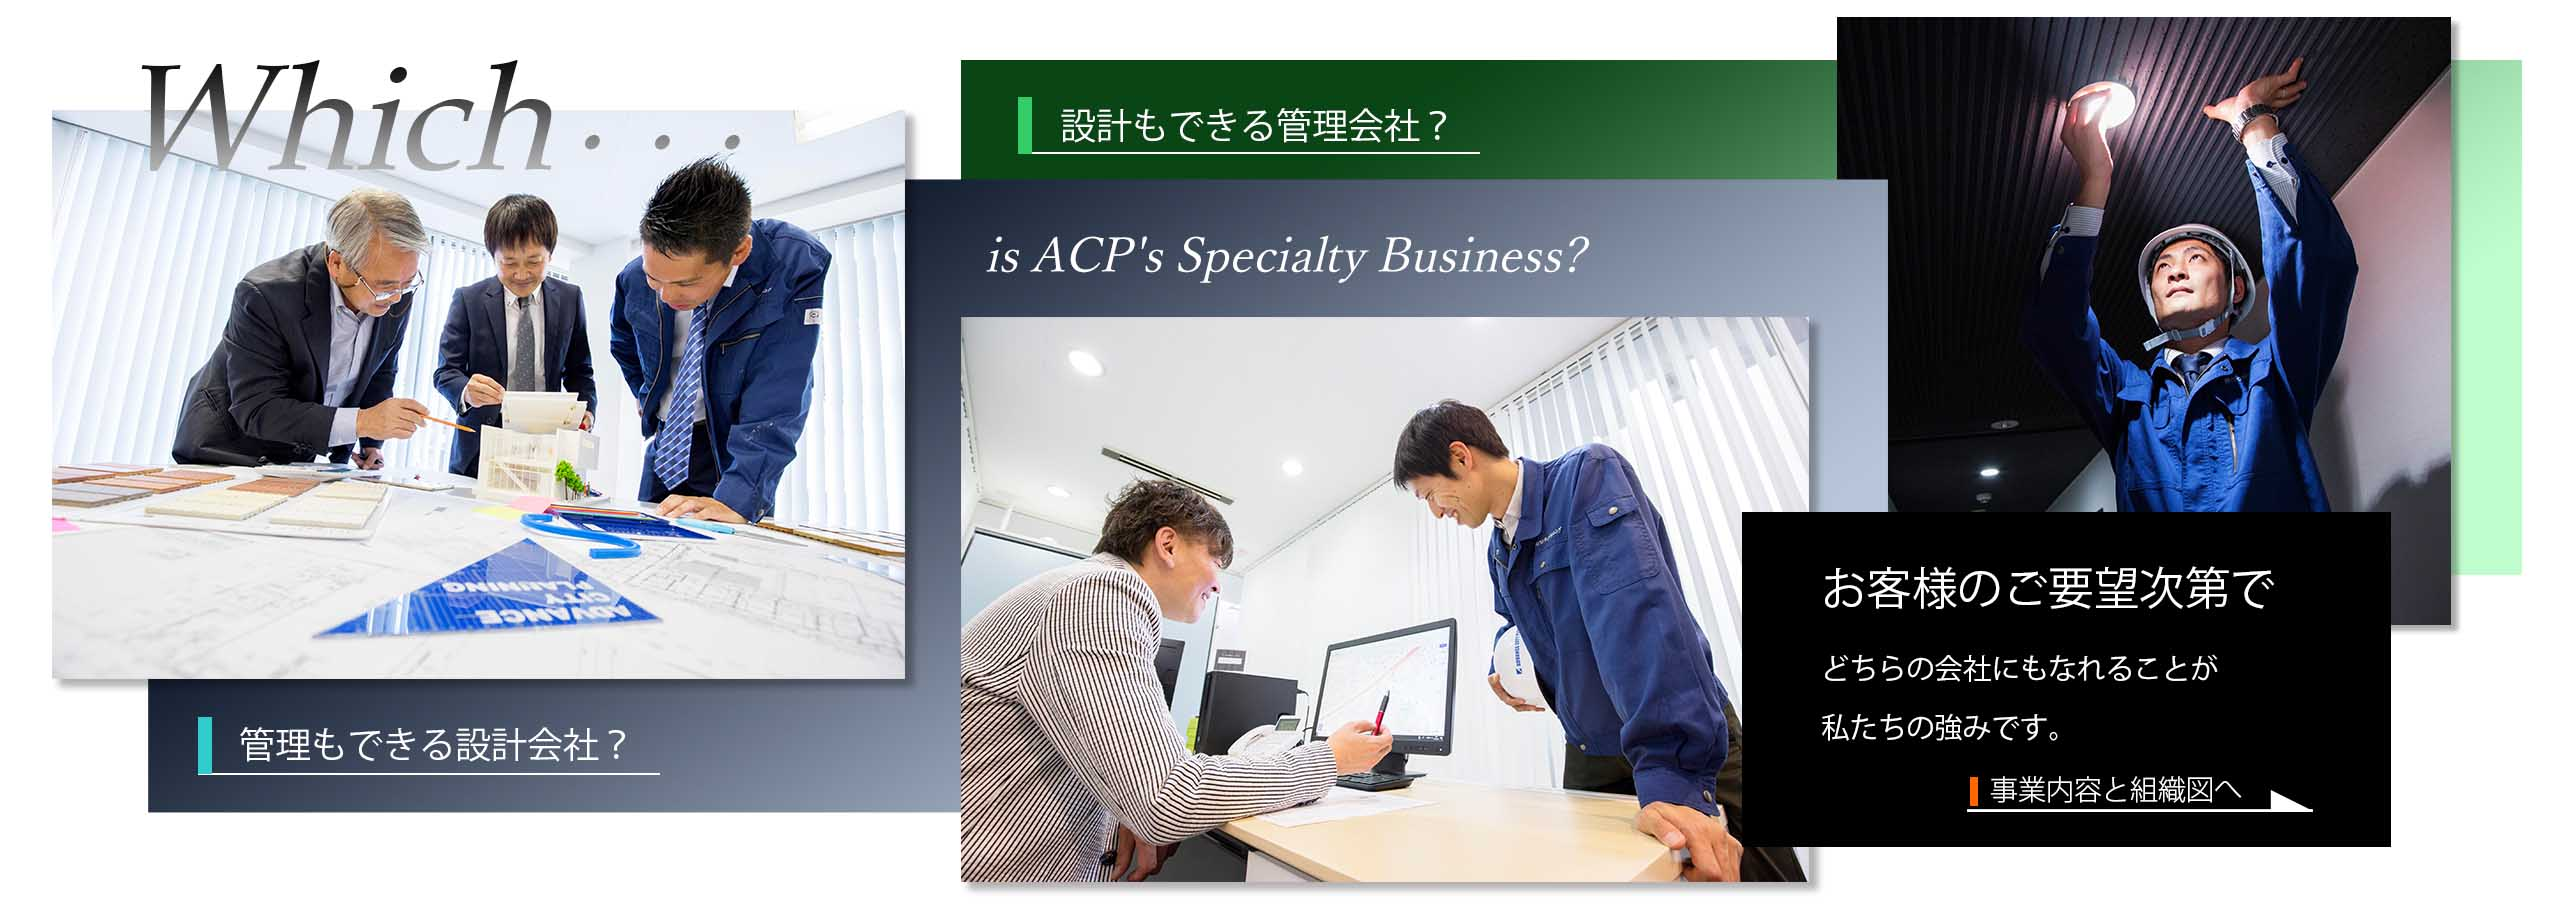 ACPの事業と組織